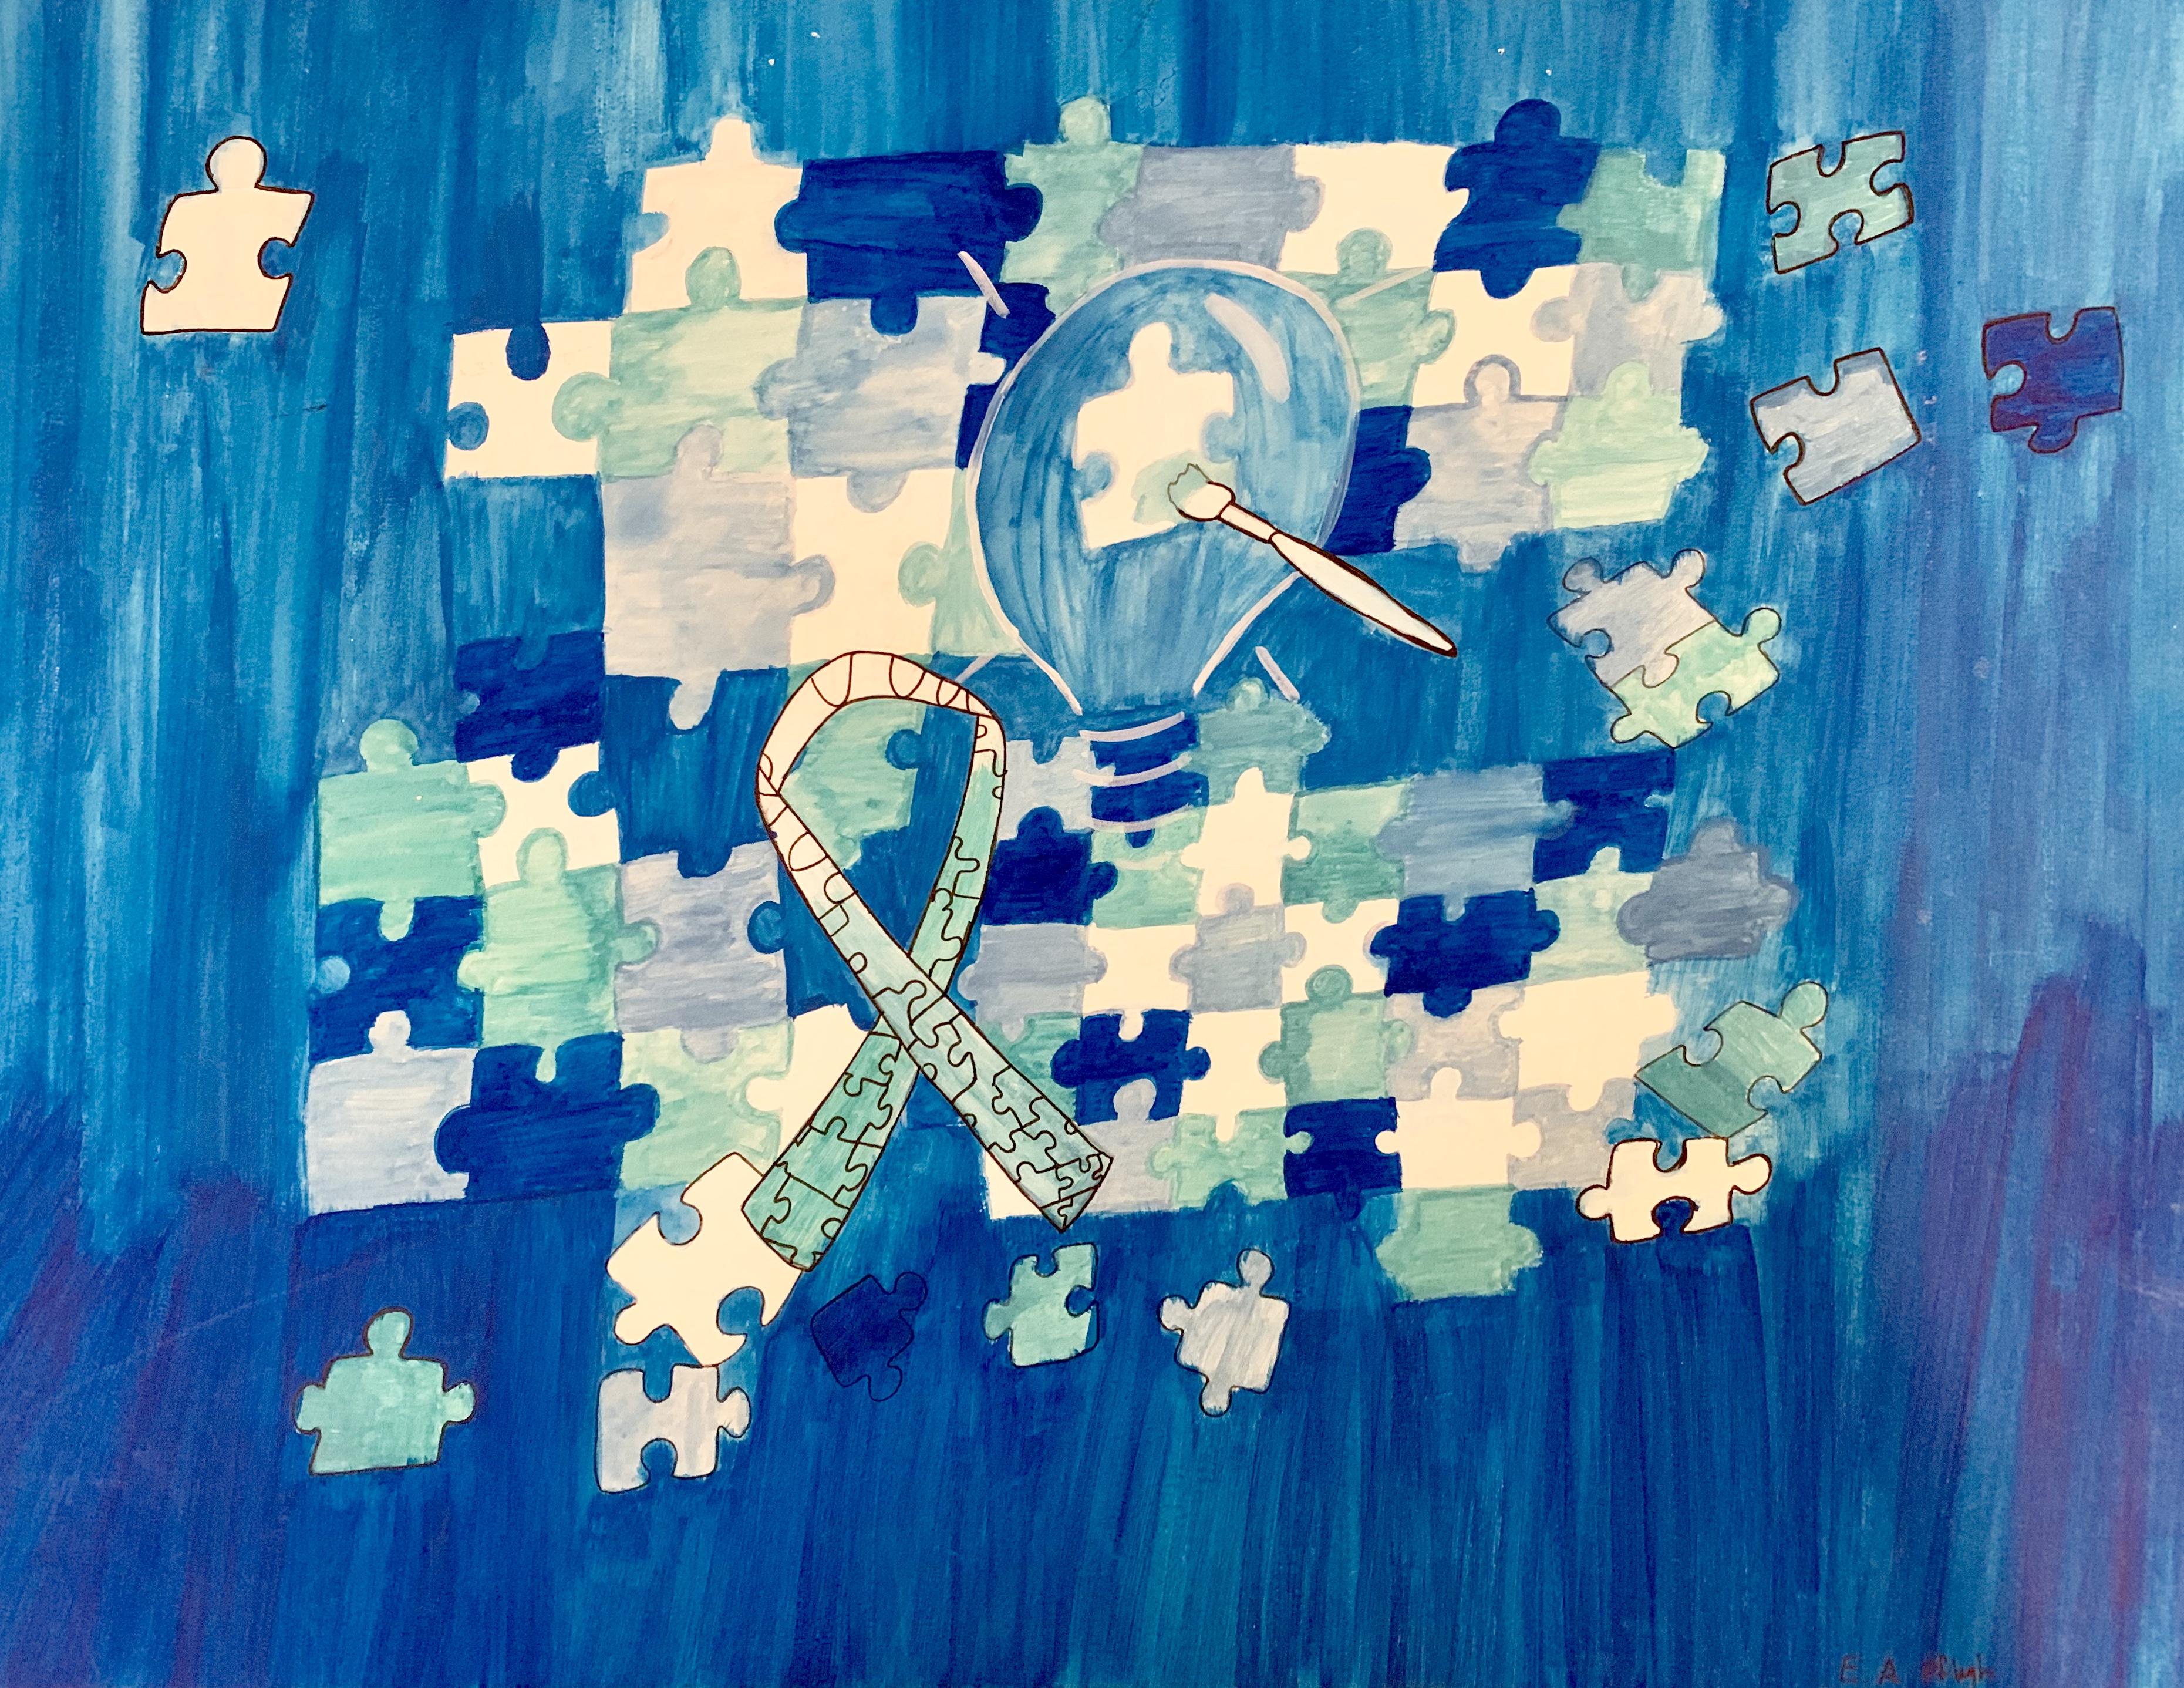 autism awareness 2019  u2013 light it up blue   u2013 the autistic